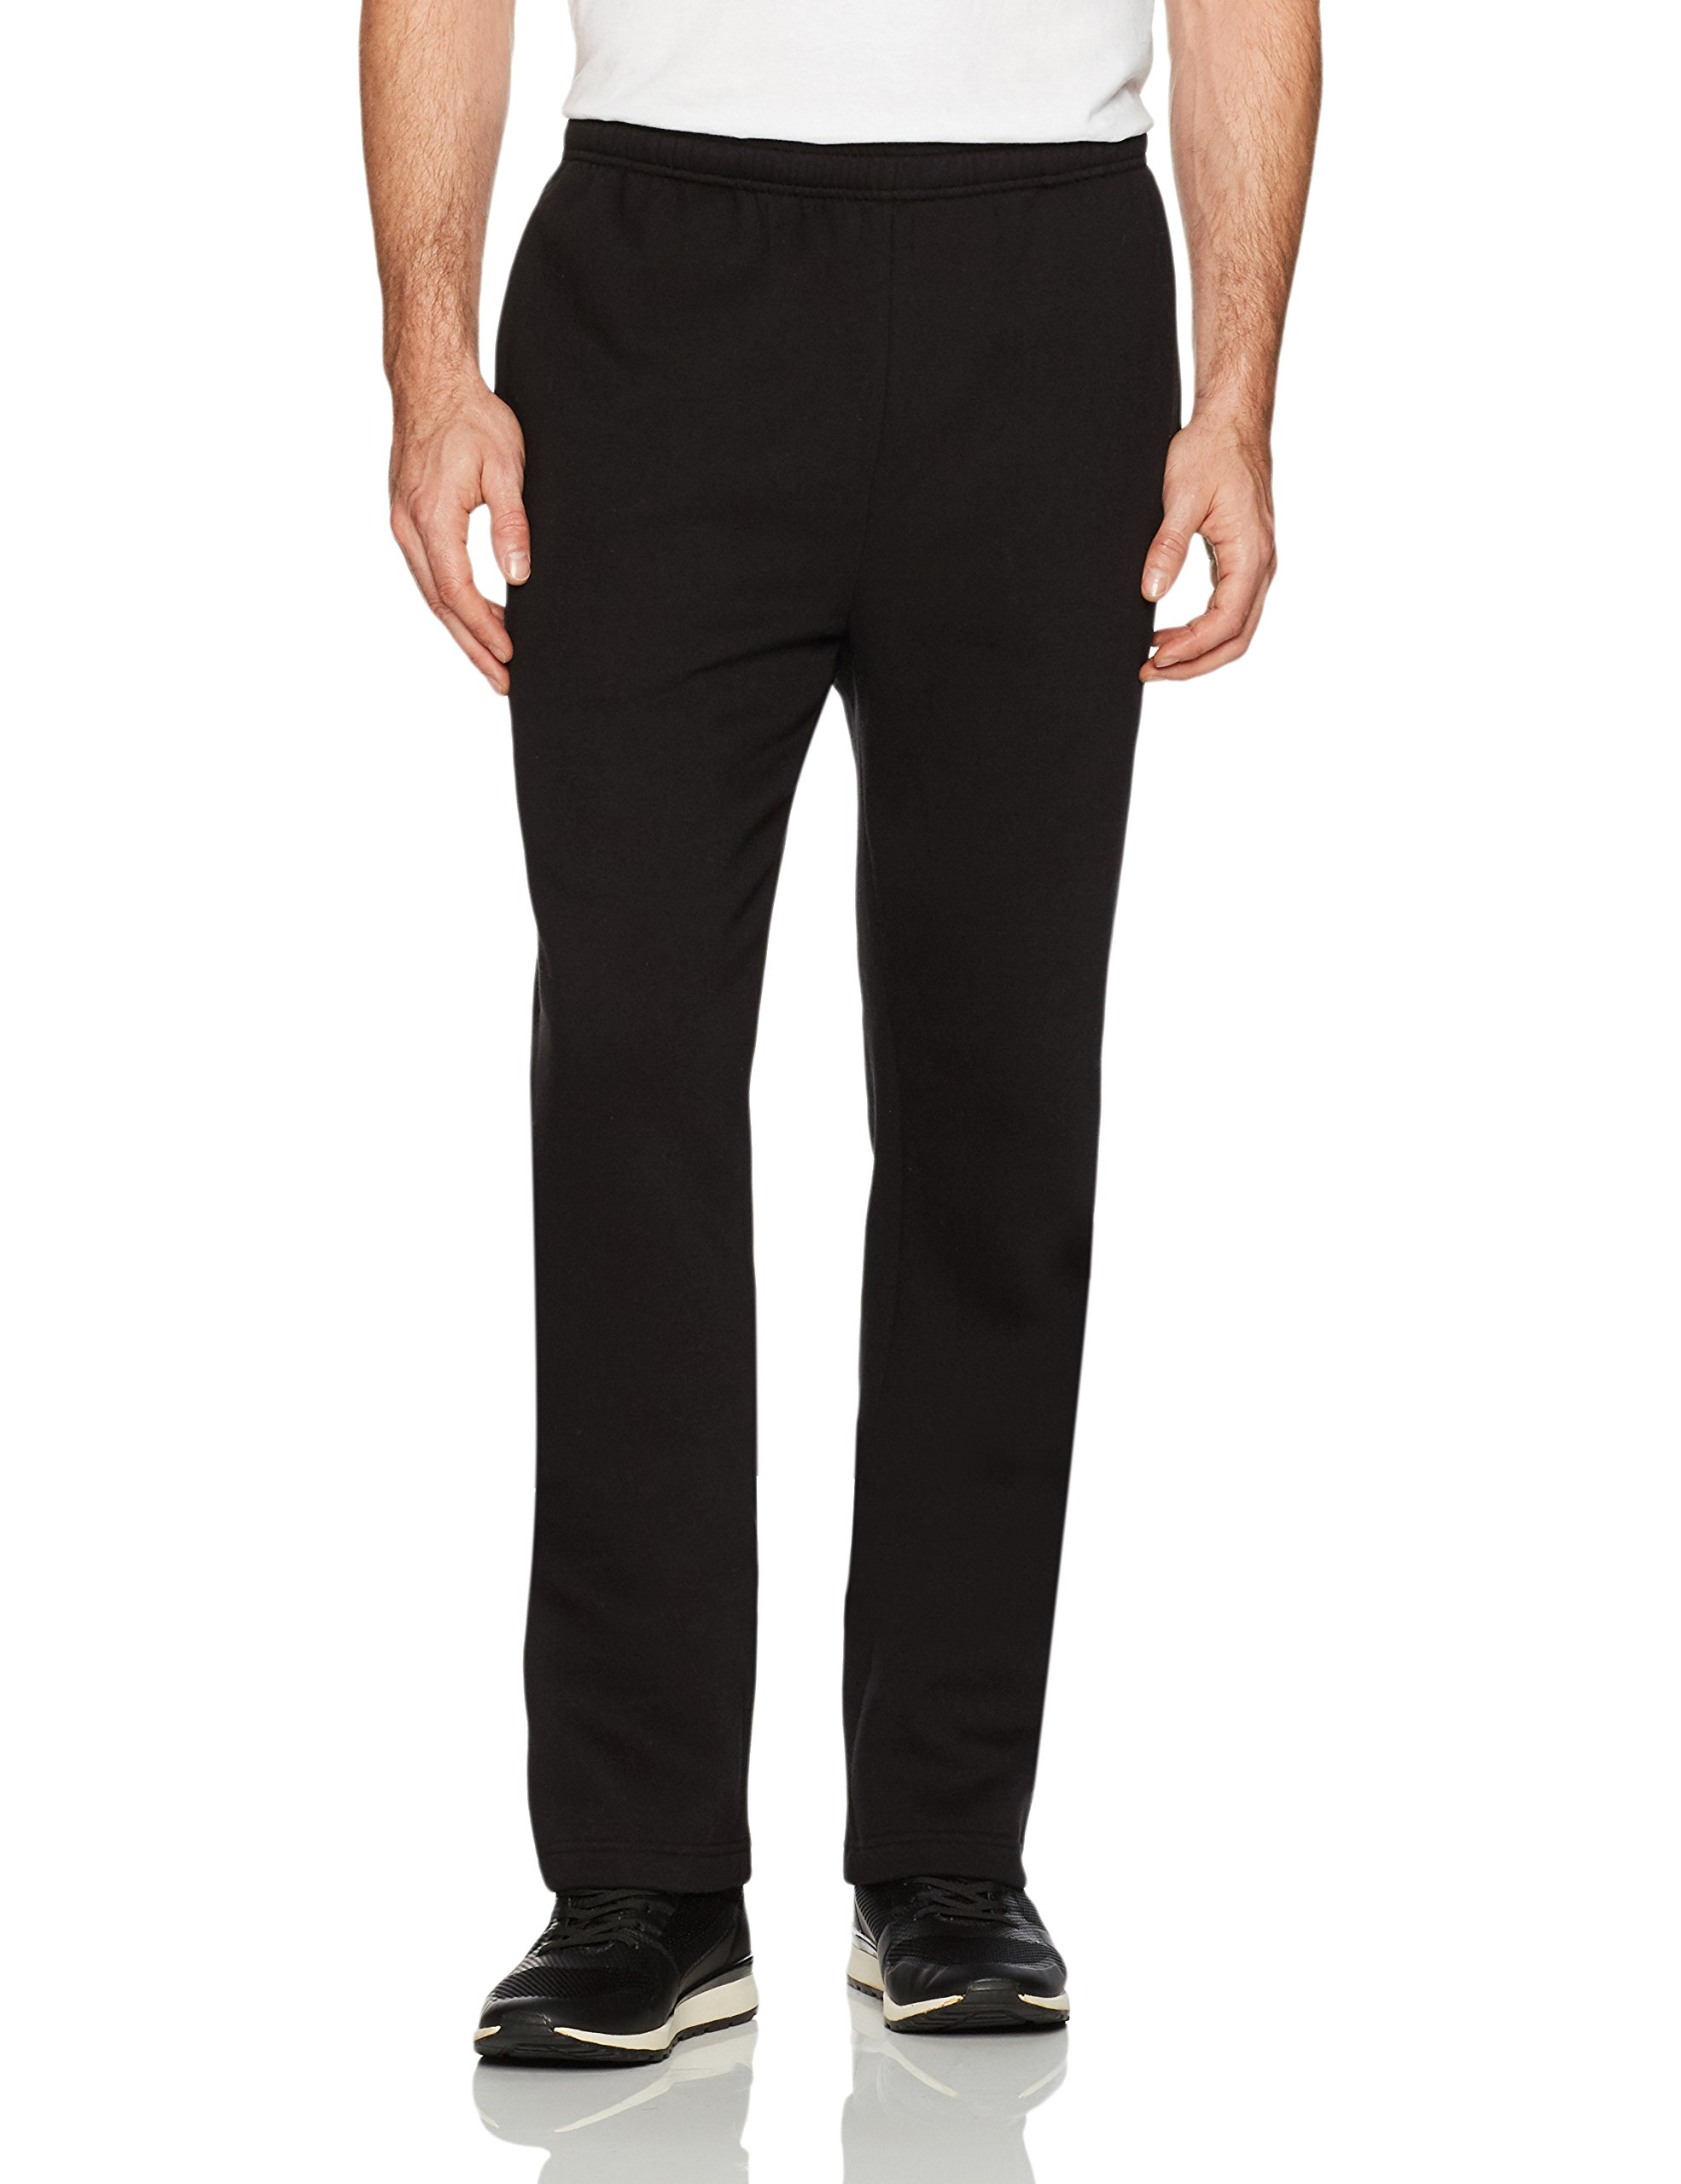 Amazon Essentials Men's Fleece Sweatpant, Black, X-Large